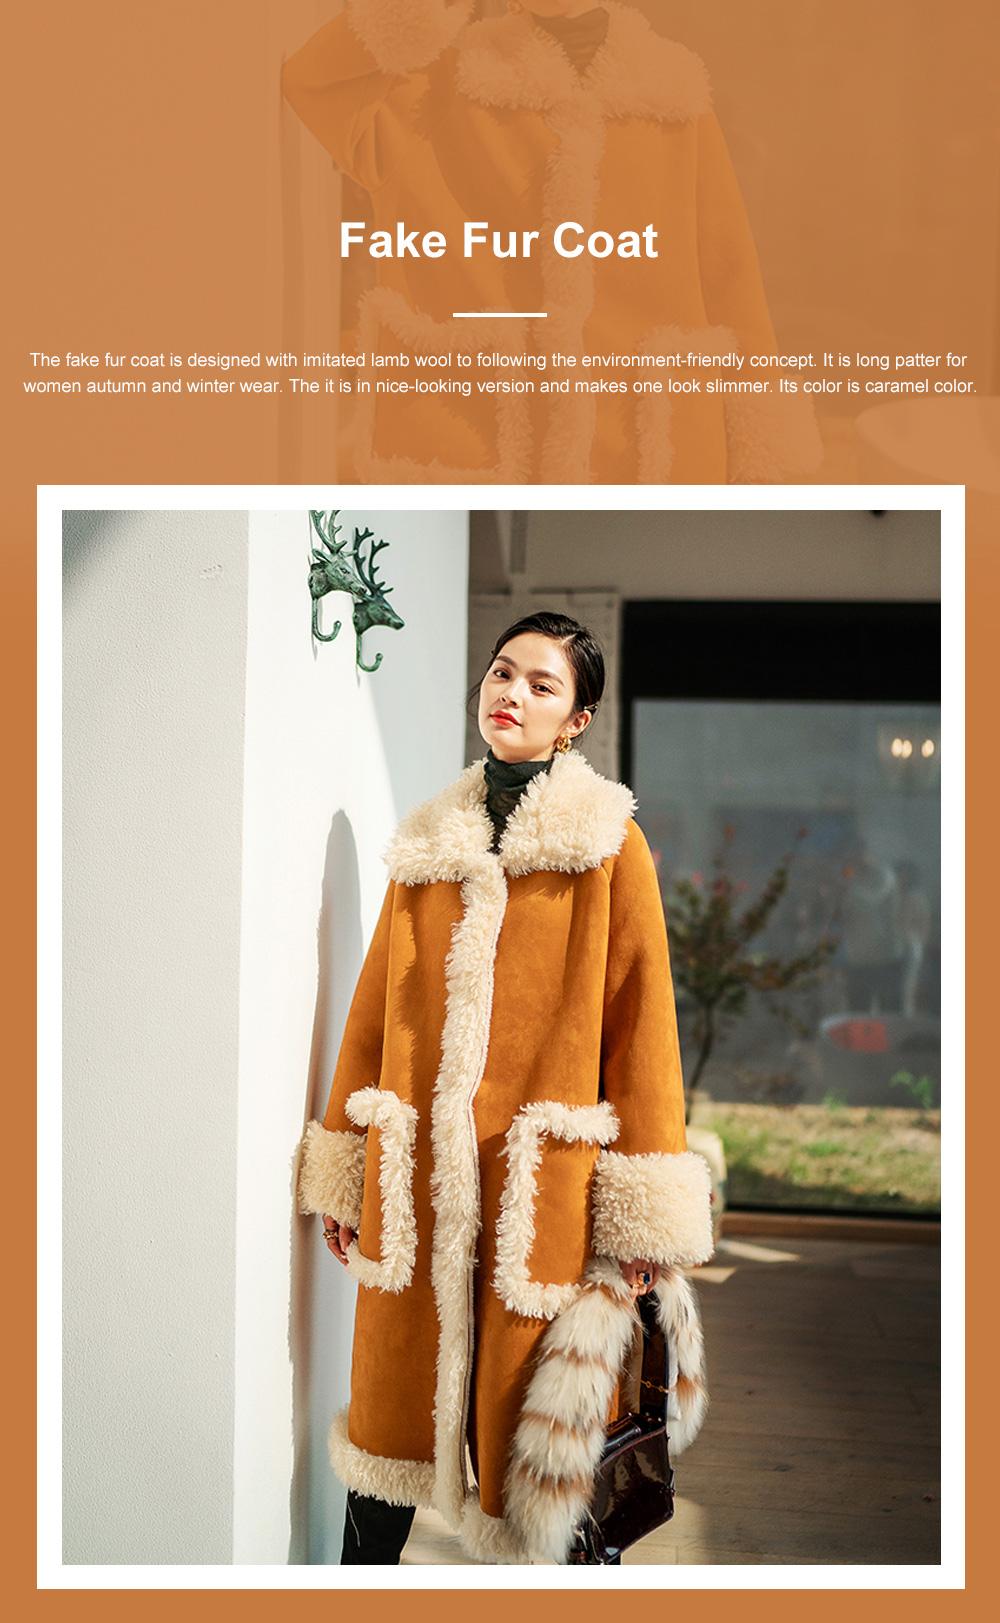 Fake Fur Long Coat for Women Wear Imitated Lamb Wool Great Coat Autumn Winter 2019 0